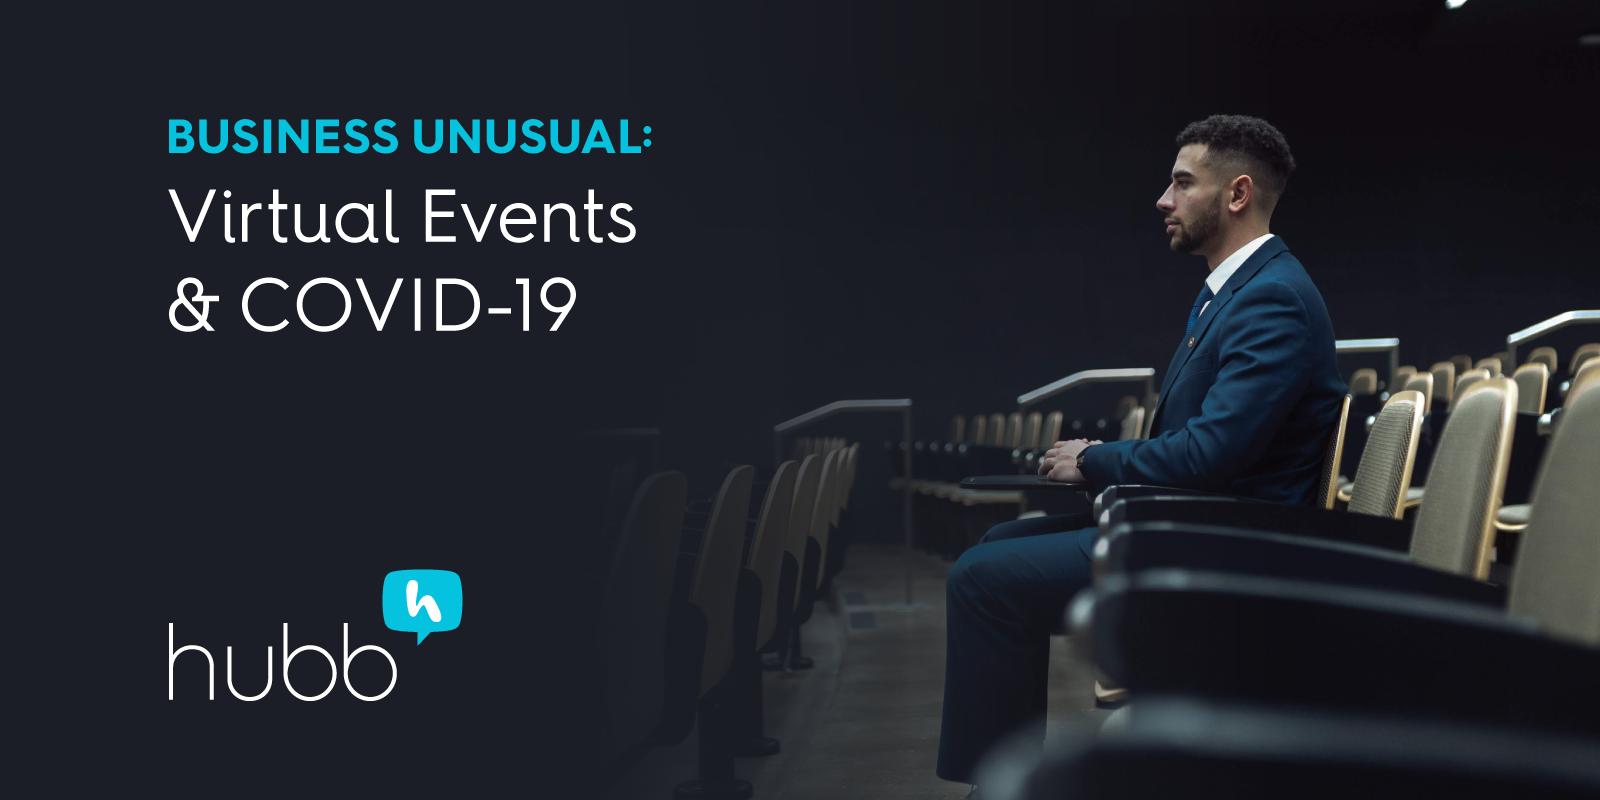 Business Unusual: Virtual Events & COVID-19